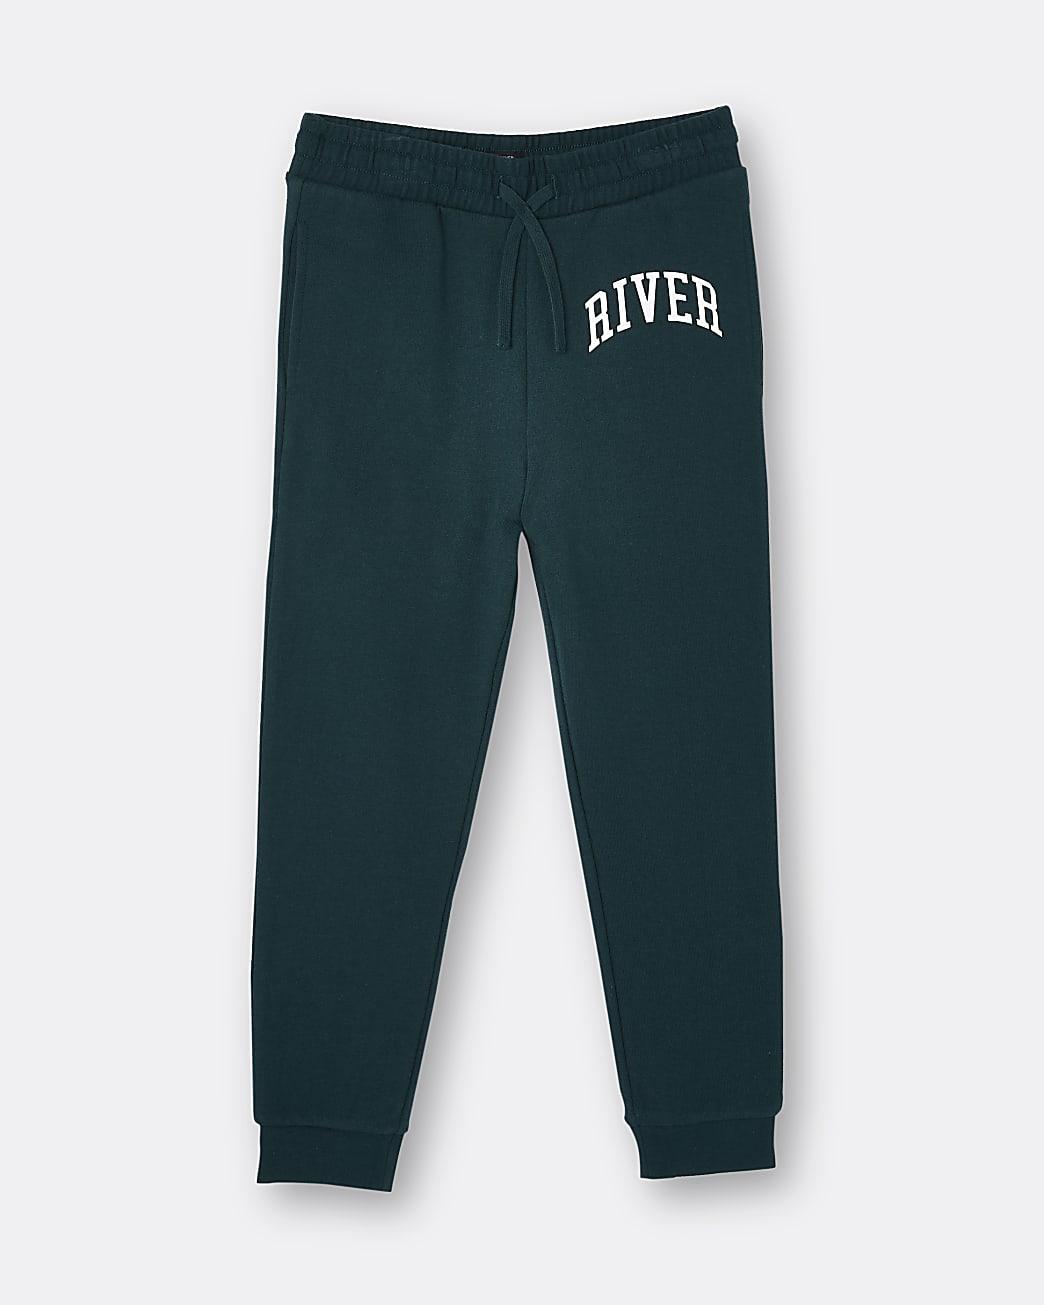 Boys green River joggers